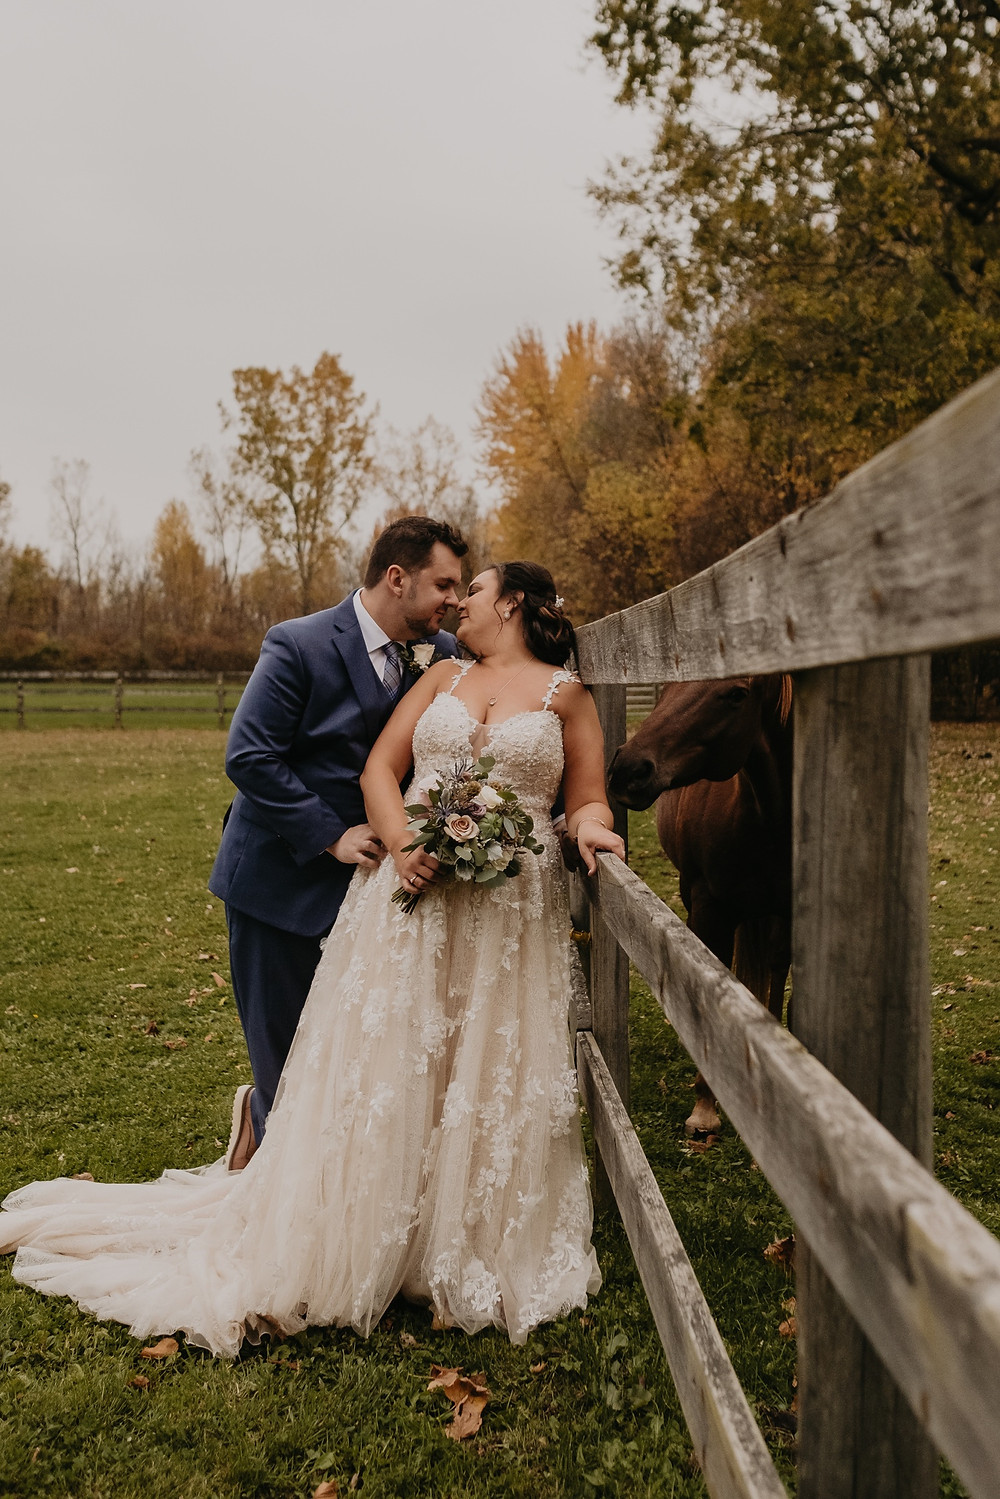 Michigan bride and groom wedding photos at barn with horse